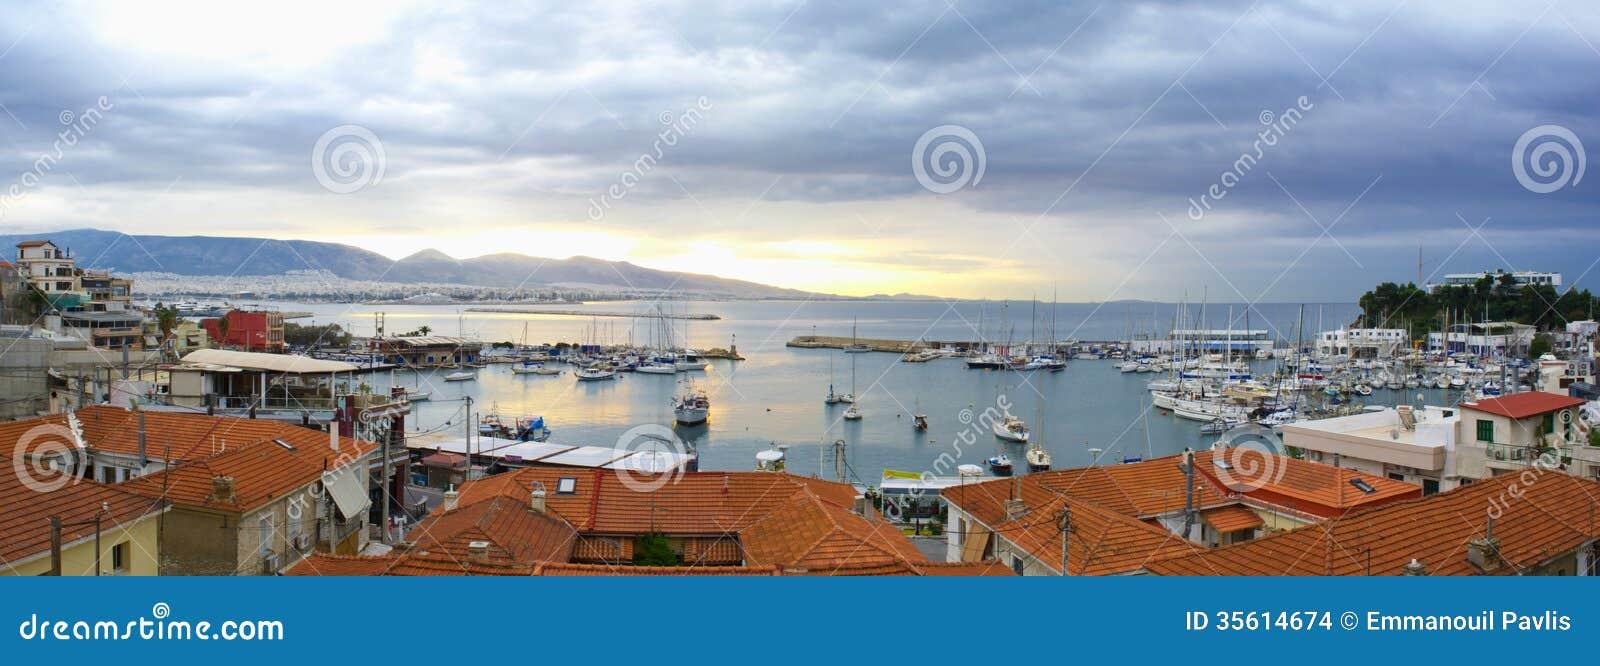 Pittoresk port